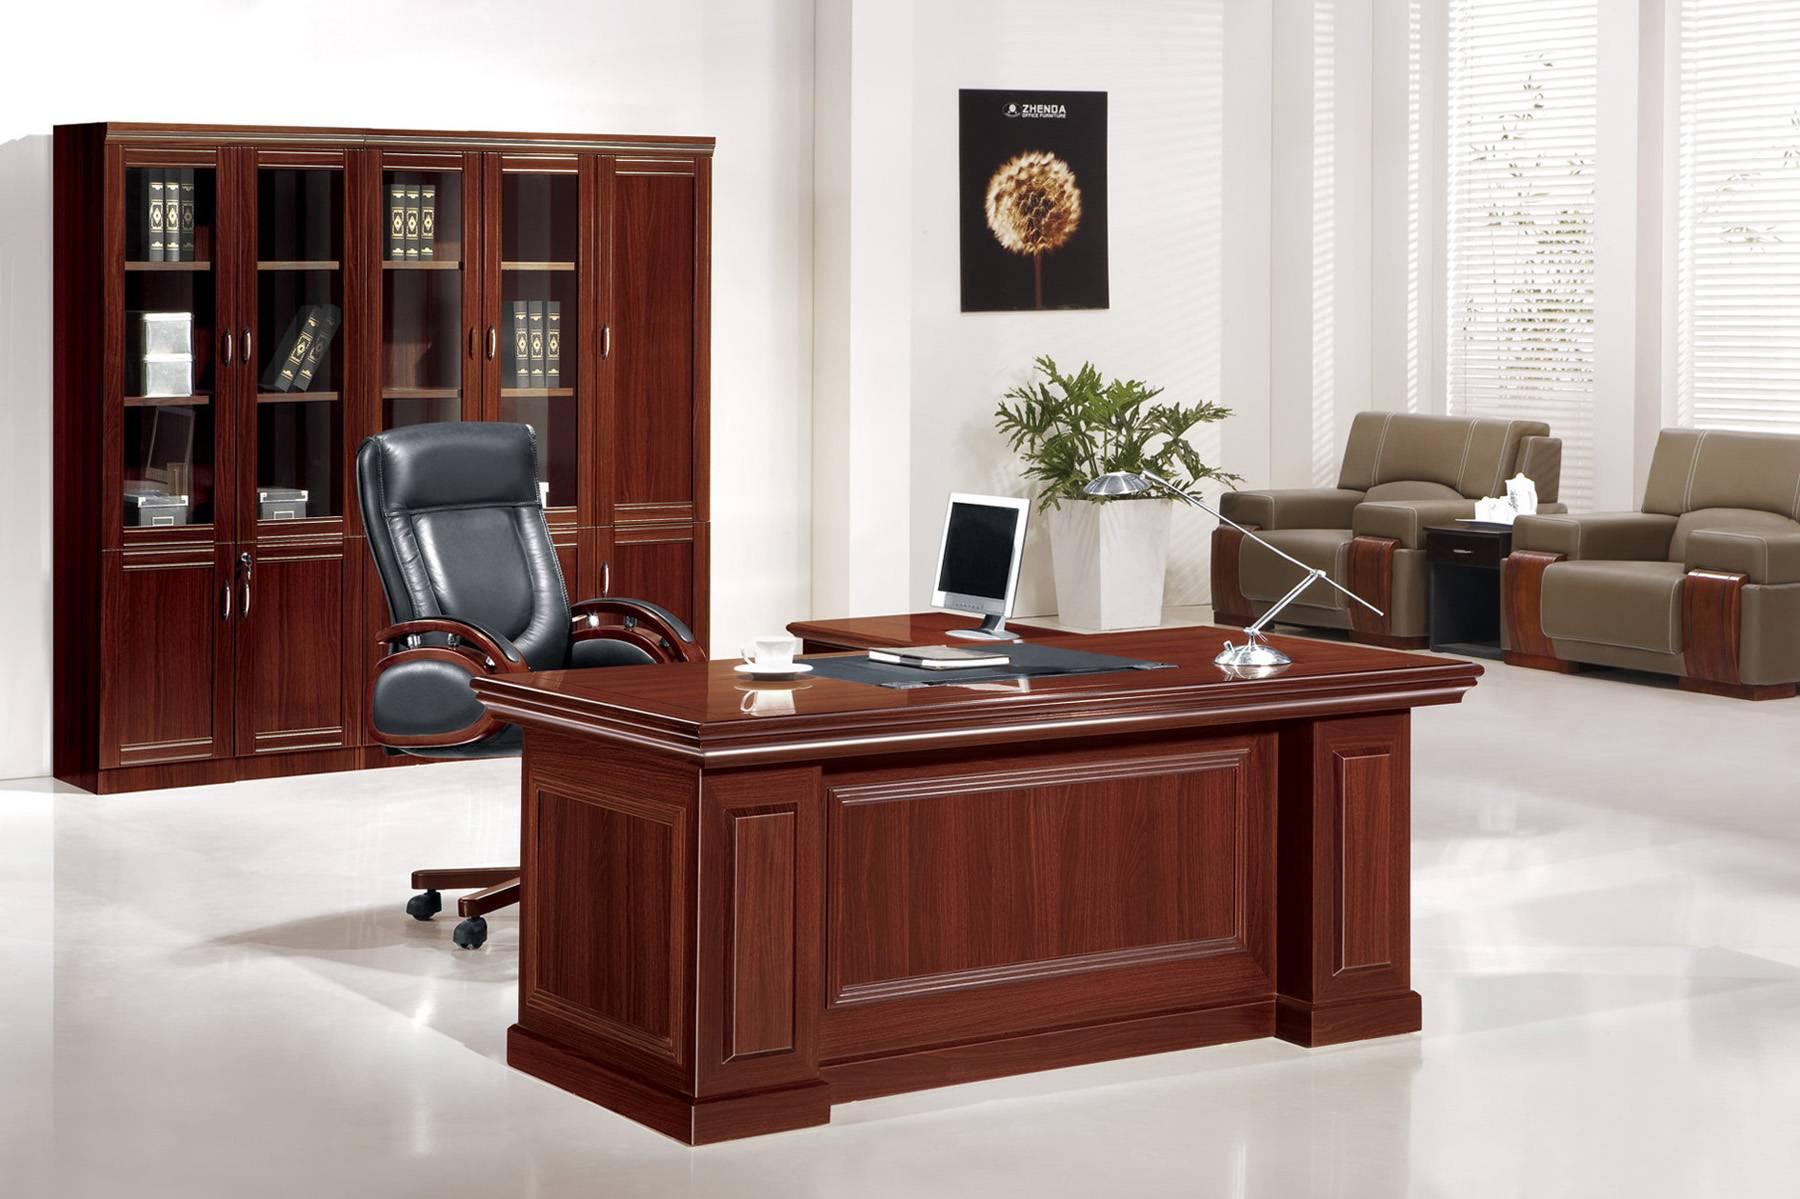 mdf office table in cherry 1810 foshan zhenda